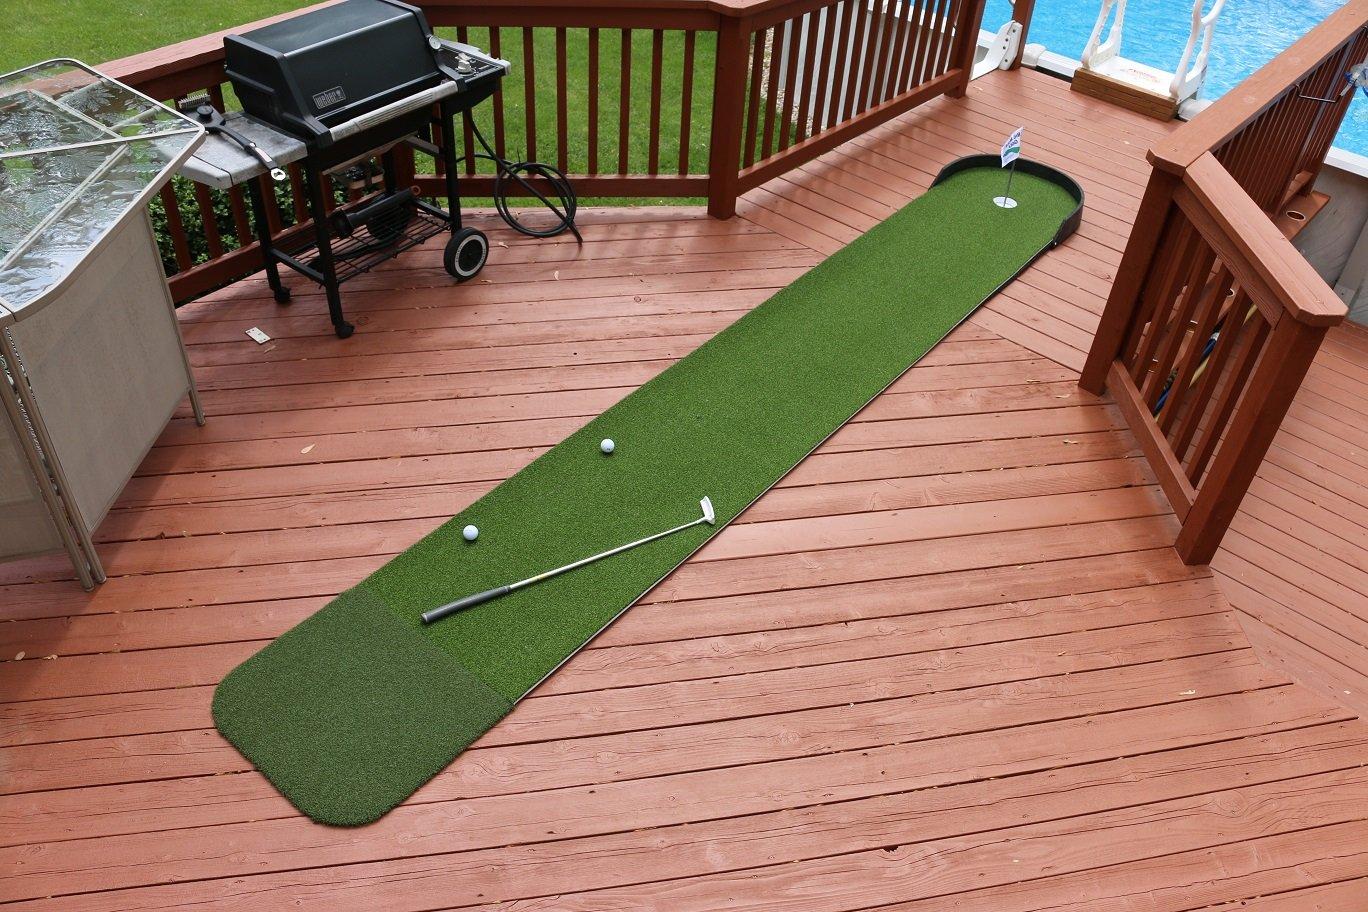 Big MossゴルフCommander 3 ' x 15 ' Practice Putting Chipping Greenインドア/アウトドア   B077BPXK72